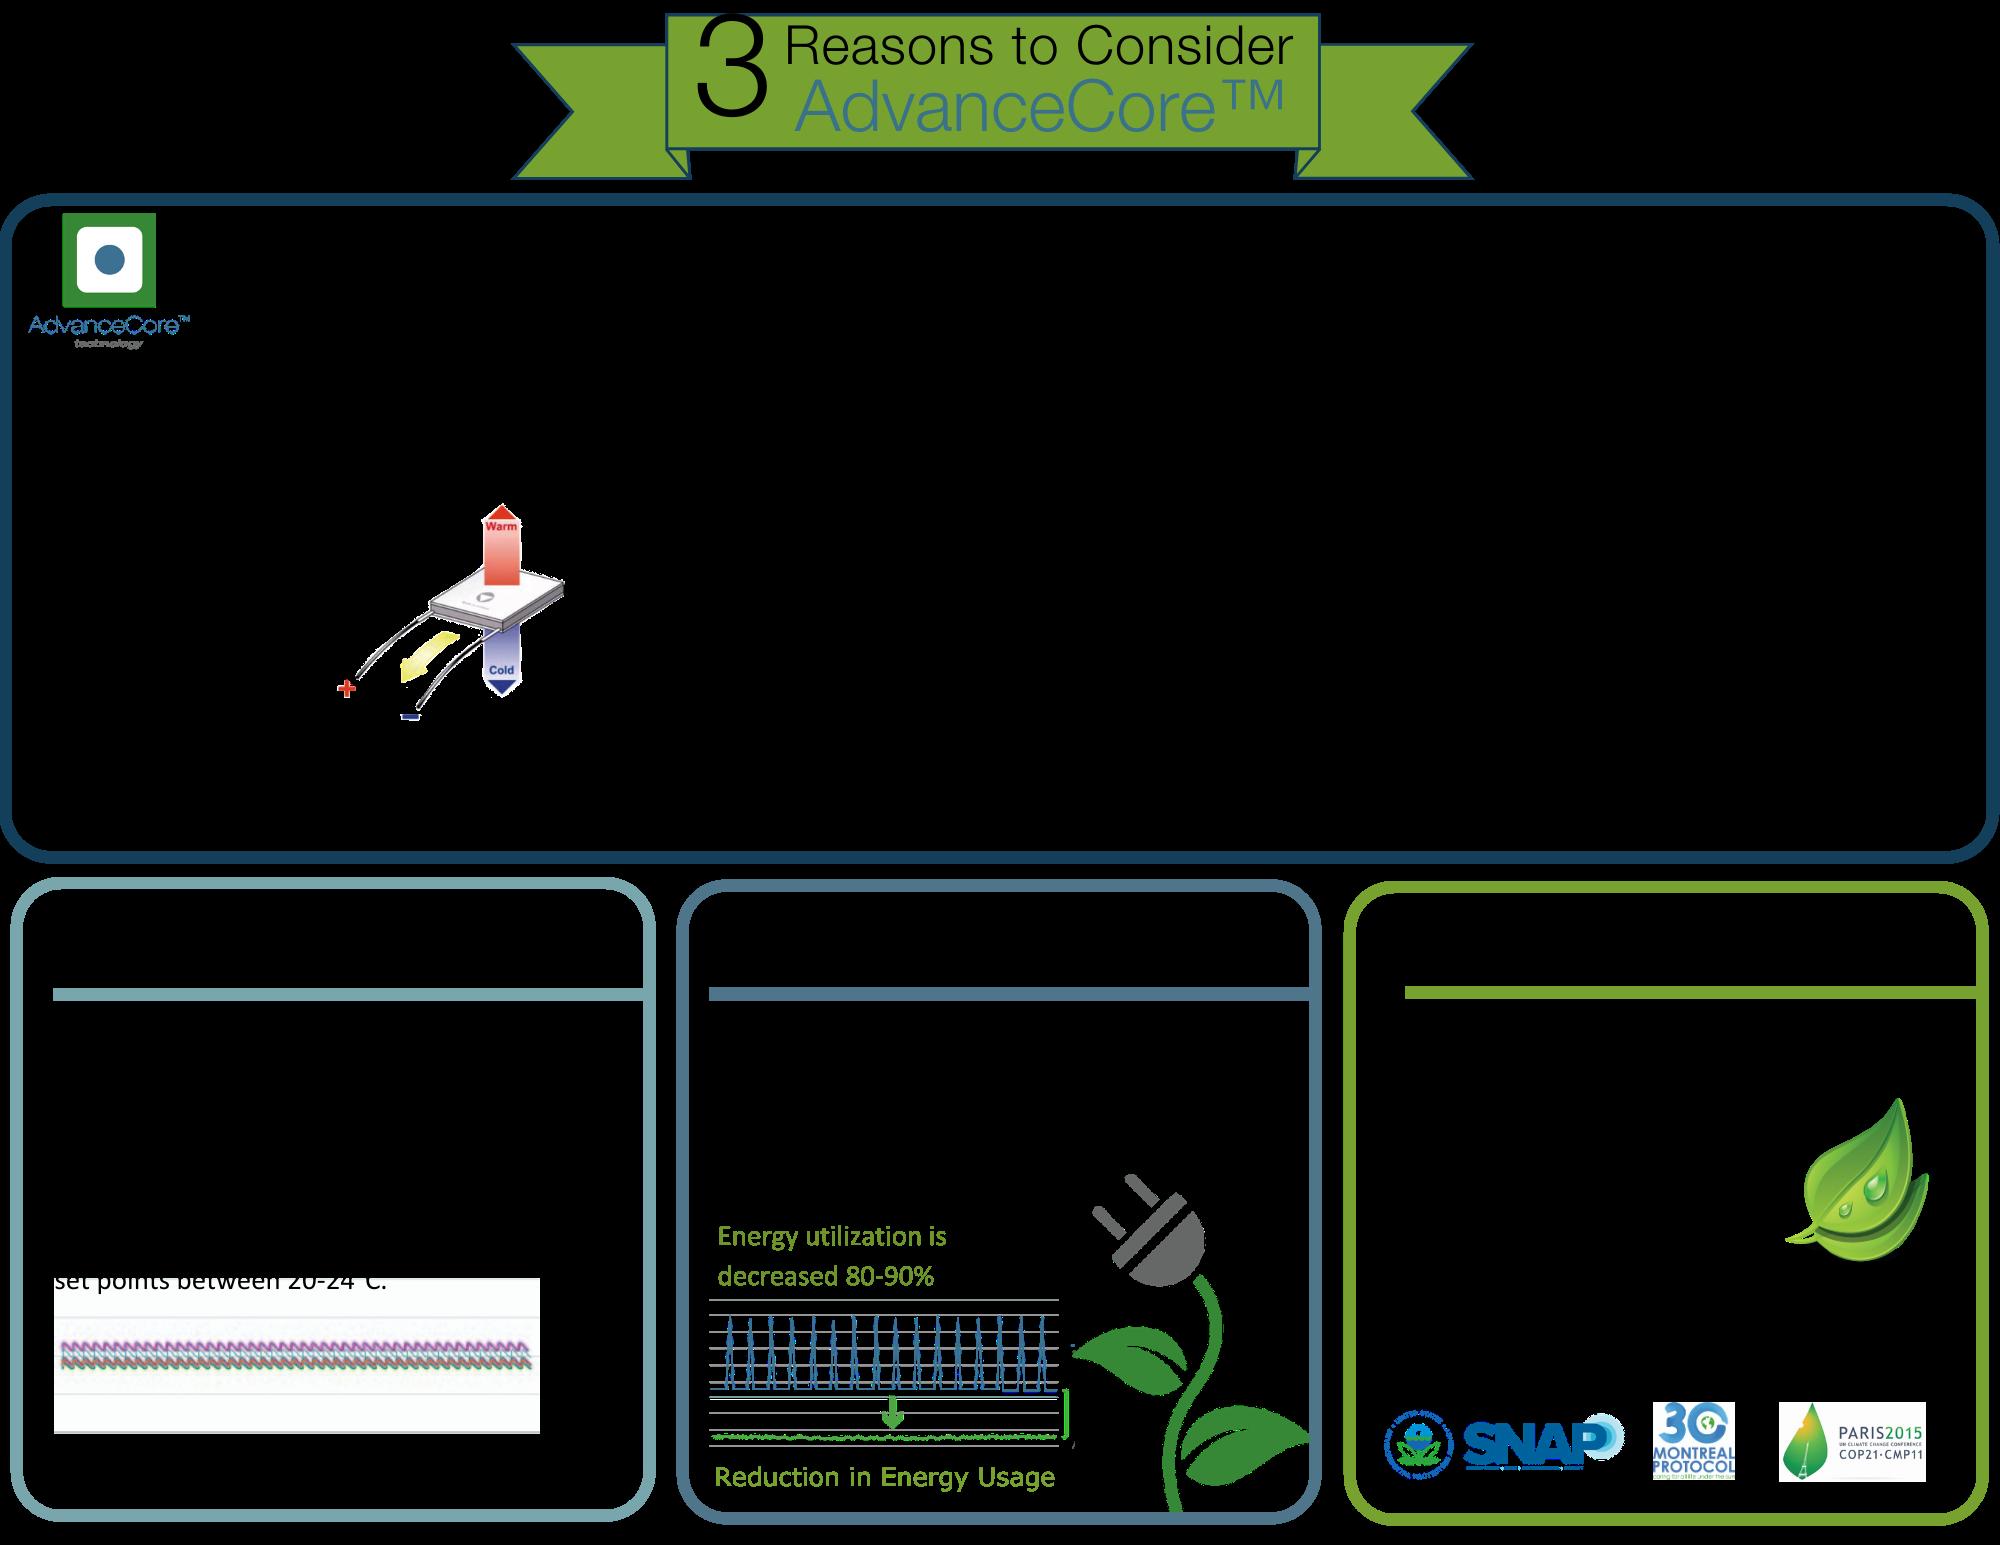 3 Reasons to Consider AdvanceCore.pdf   (2)